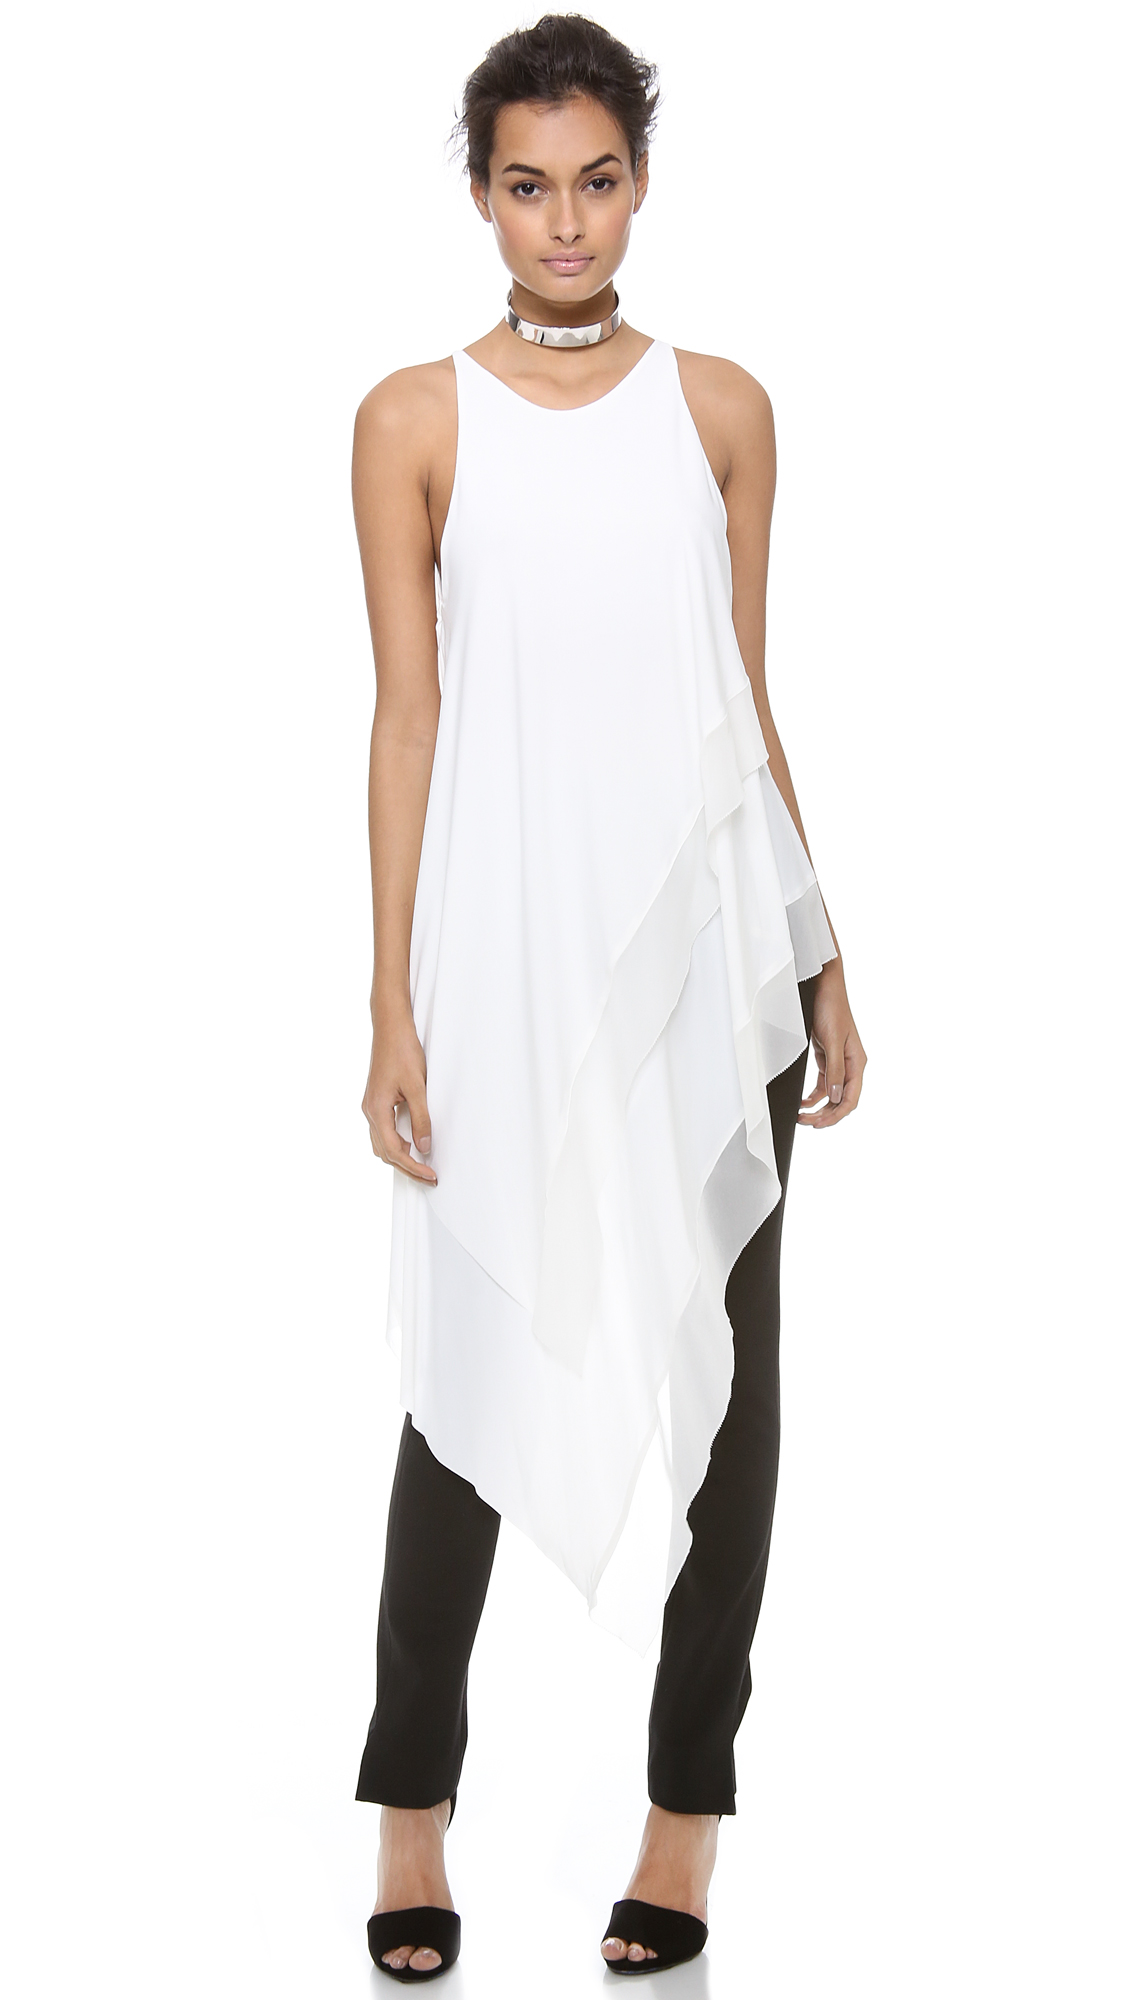 Donna karan new york sleeveless asymmetric top in white for Donna karan new york